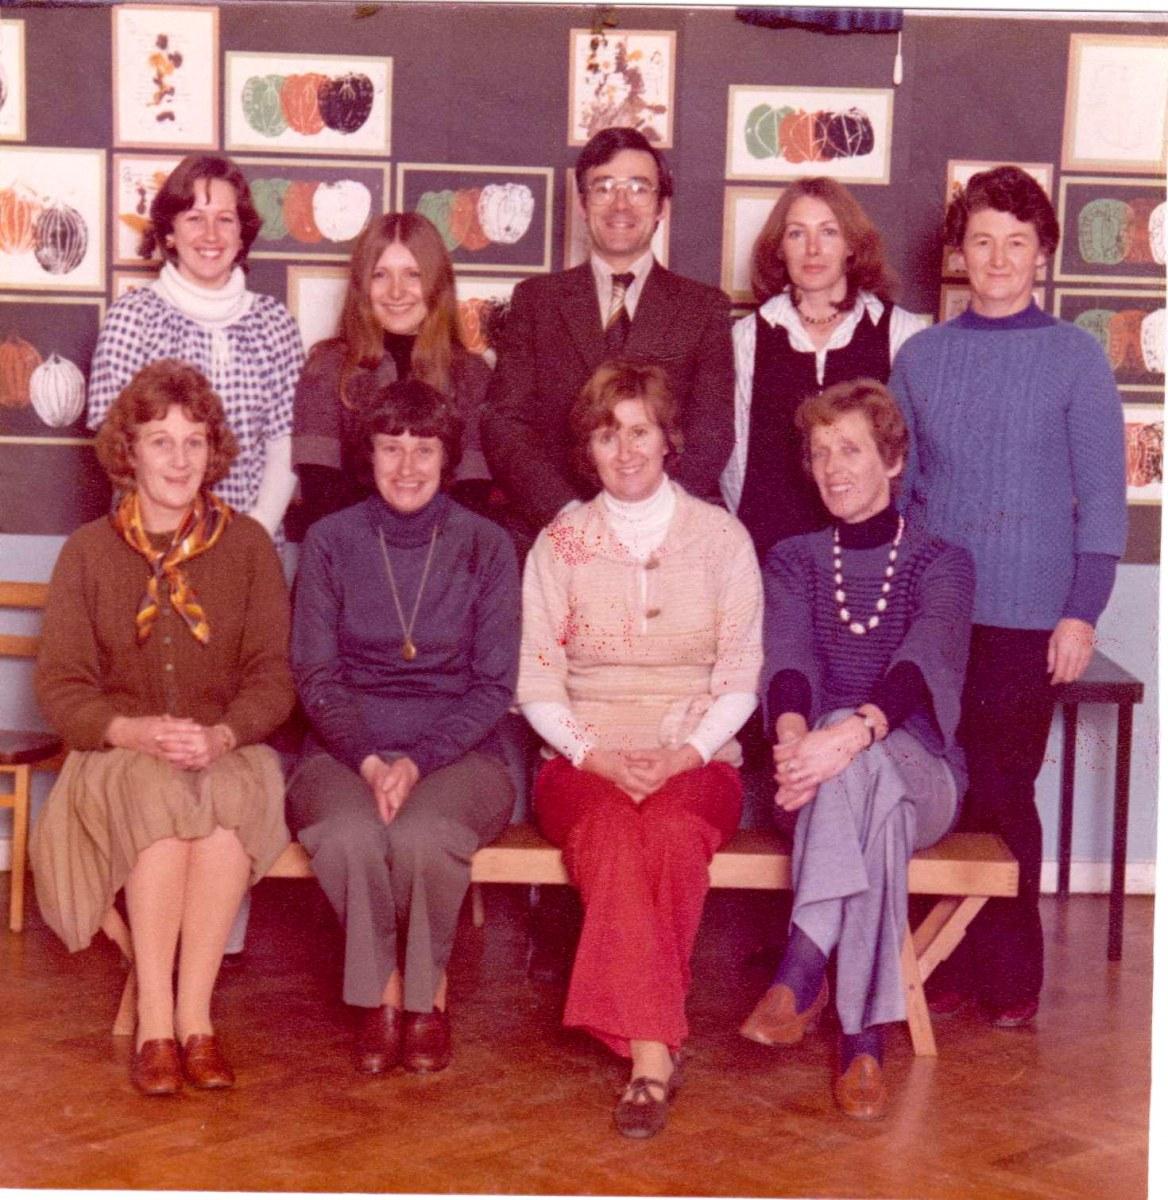 c. 1977 Middle Barton School Staff - Back row (l-r) Christine Grief, Theresa Winter, Martin Cox (Head Teacher), Kay Gaffney, Jane Bosley. Front row Anne Ryan, Marion Pettingel, Margaret Wilson, Joan Alexander.